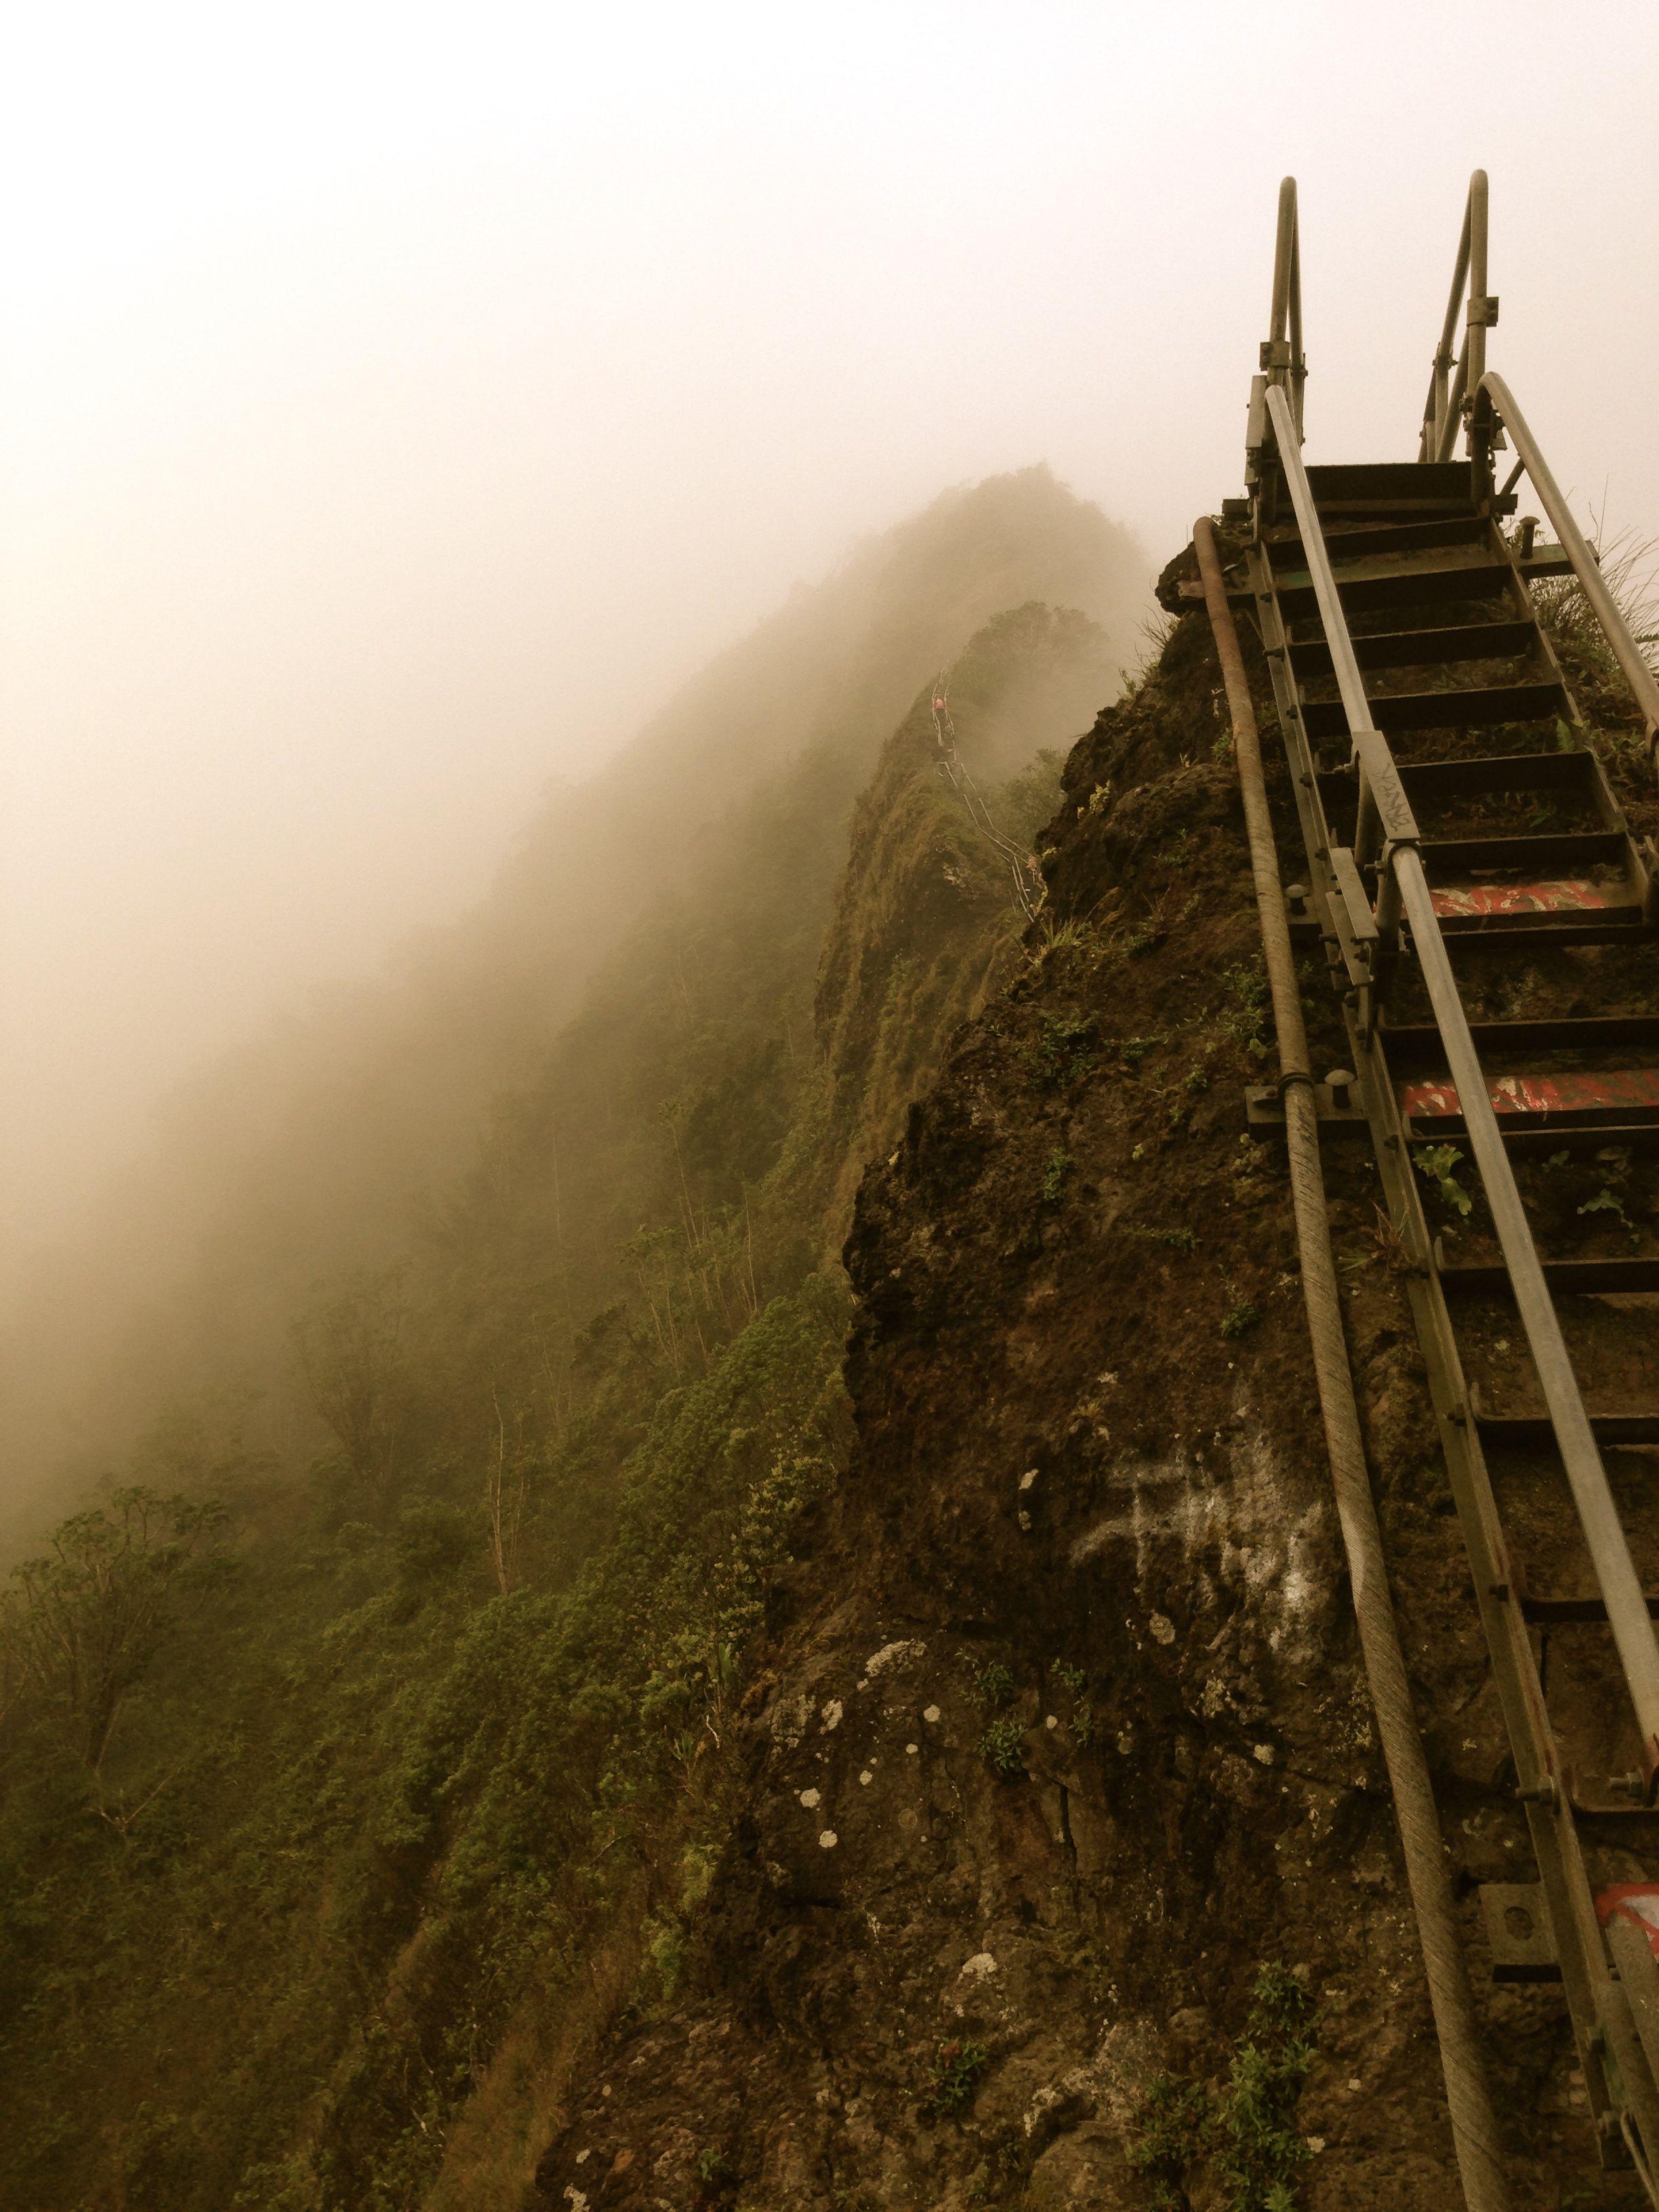 Stairway to Heaven trail (Haiku Stairs), Oahu, Hawaii